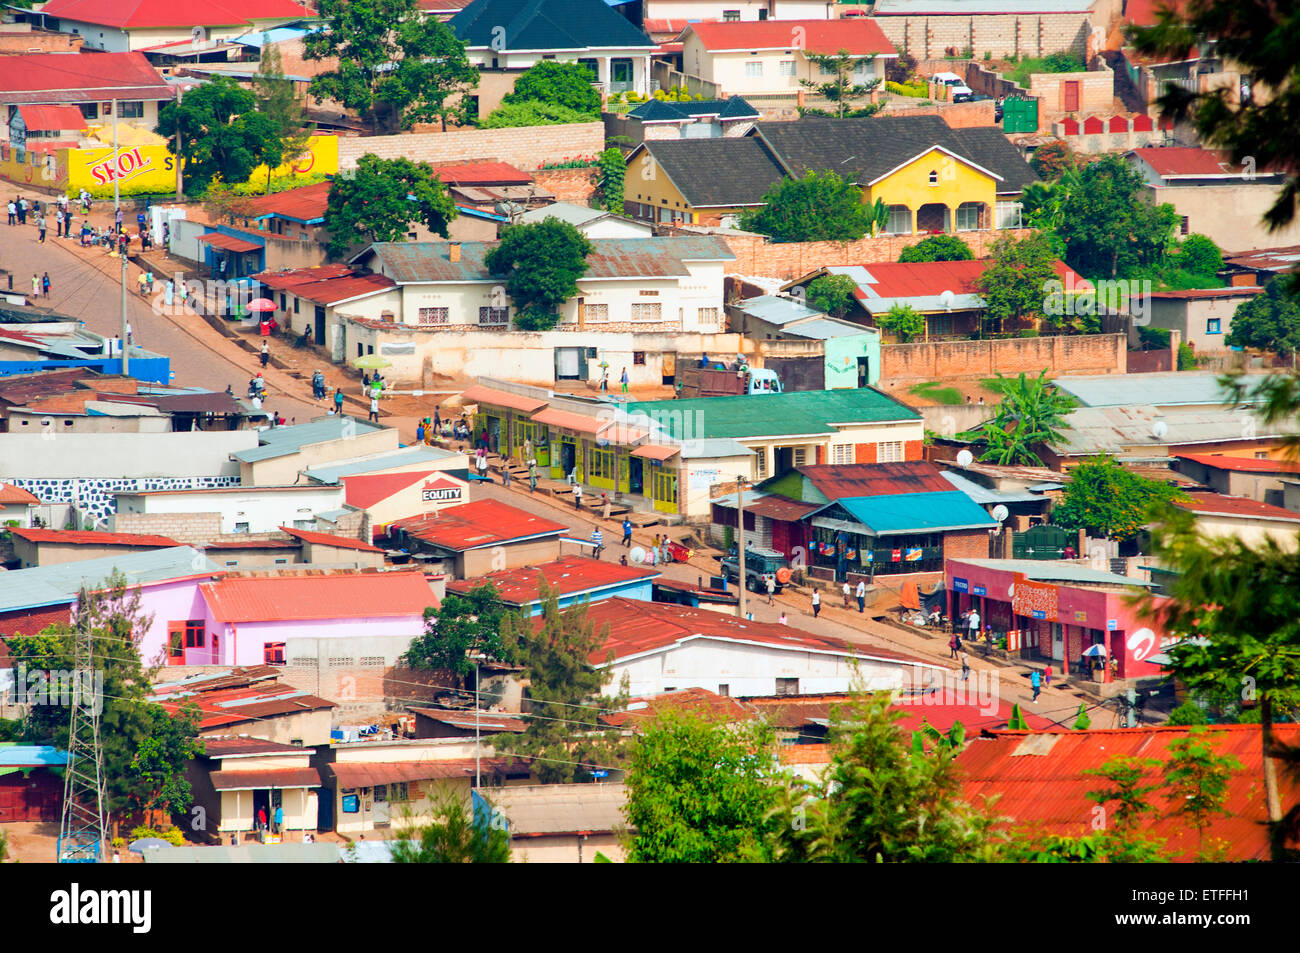 aerial view of streets and houses looking west from Nyamirambo, Kigali, Rwanda - Stock Image